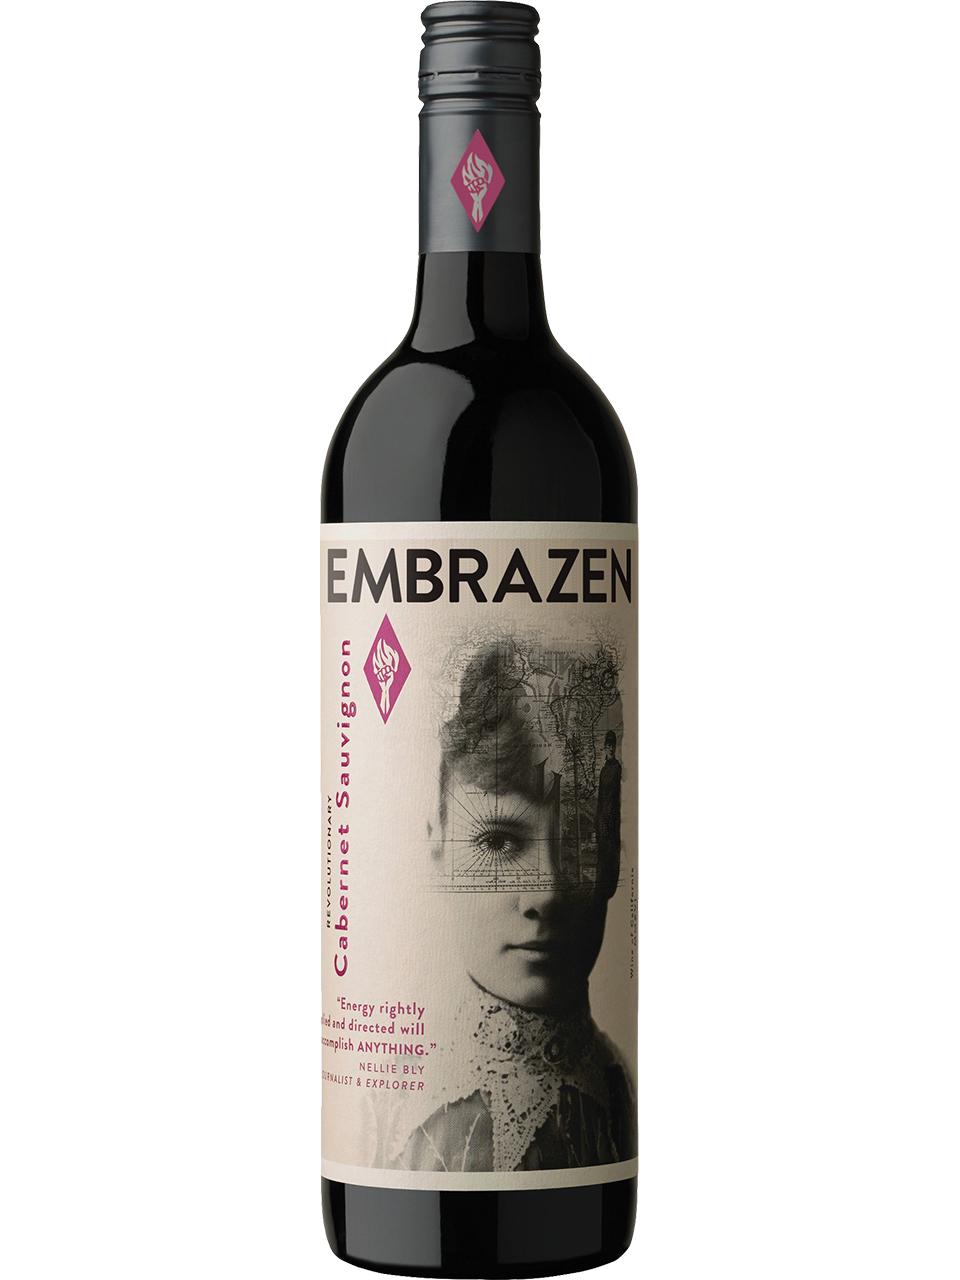 EmBrazen Cabernet Sauvignon